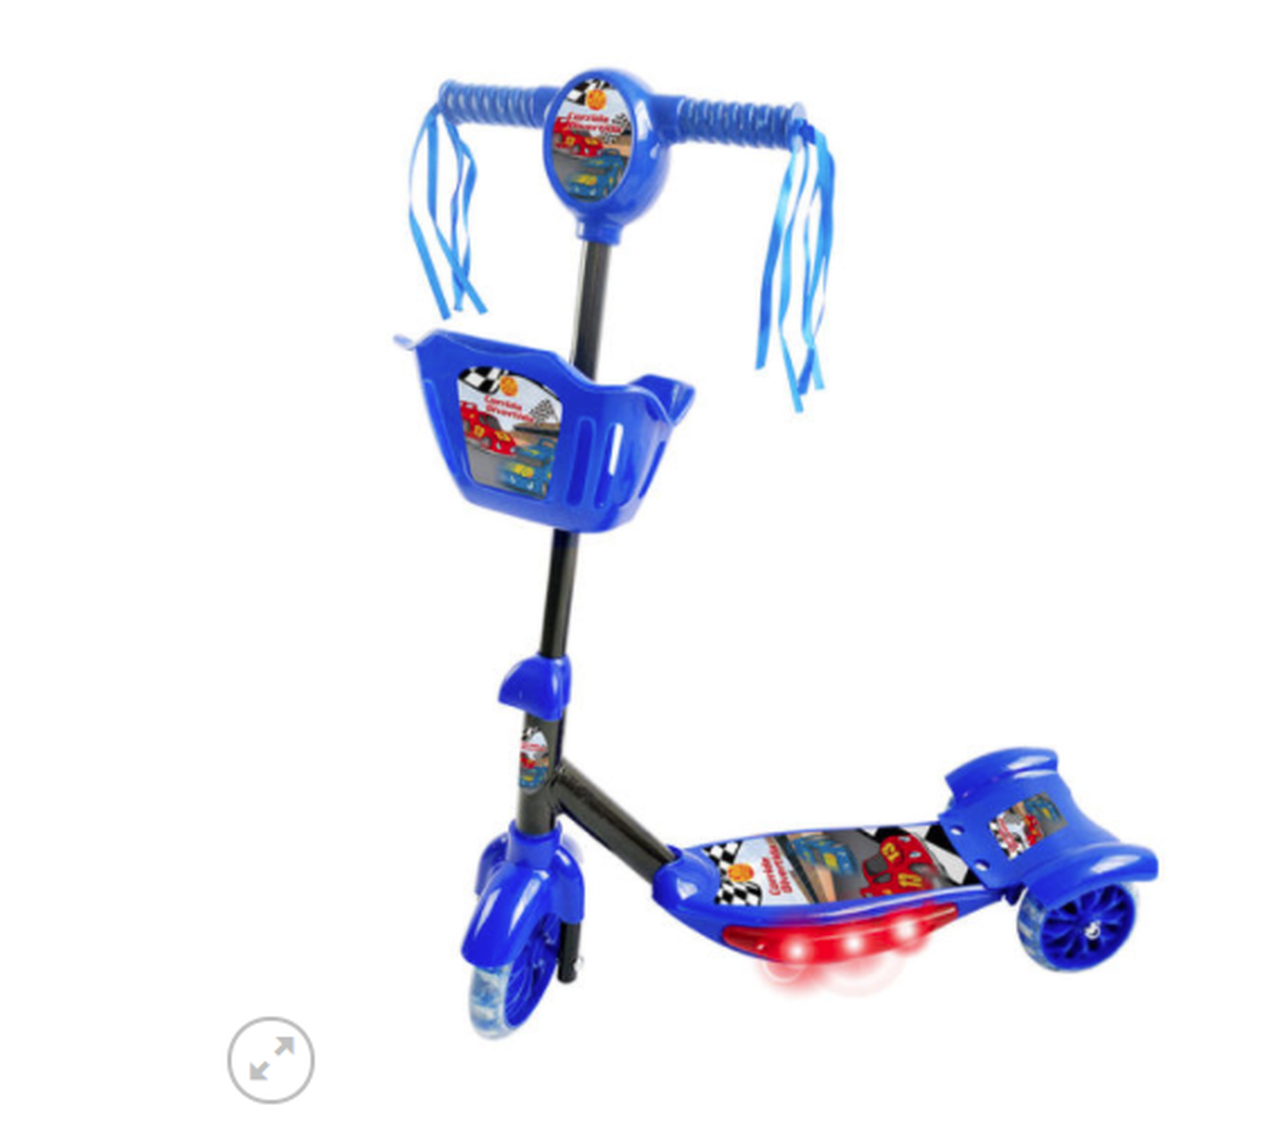 Patinete Musical Infantil 3 Rodas Azul Menino Cesta Luzes